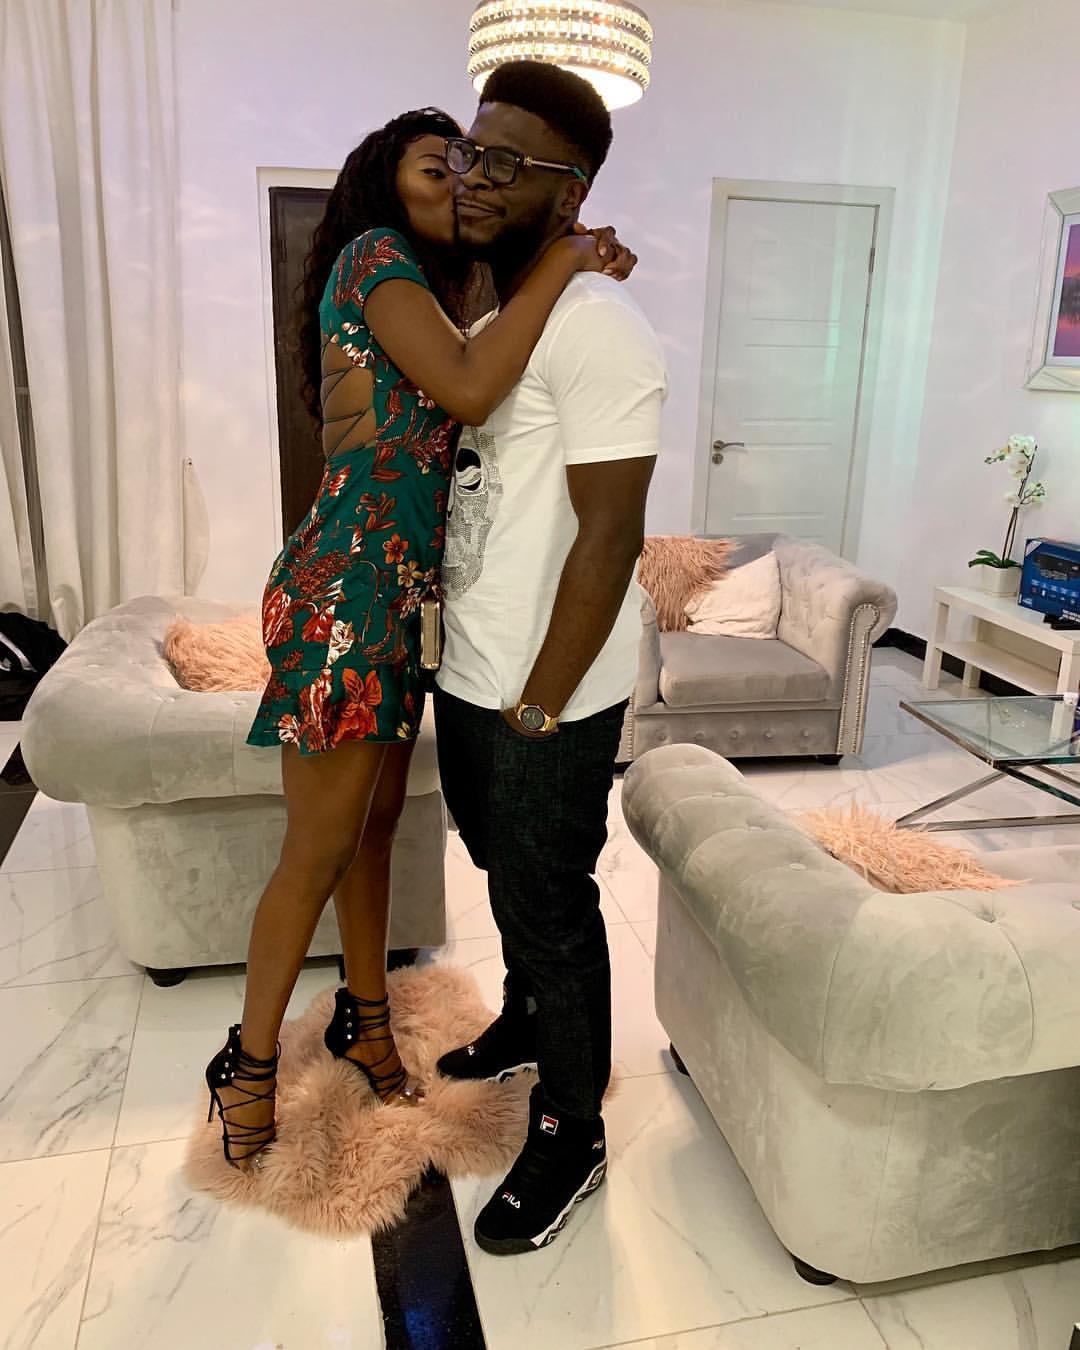 Nigerian Instagram Comedian Craze Clown With Girlfriend